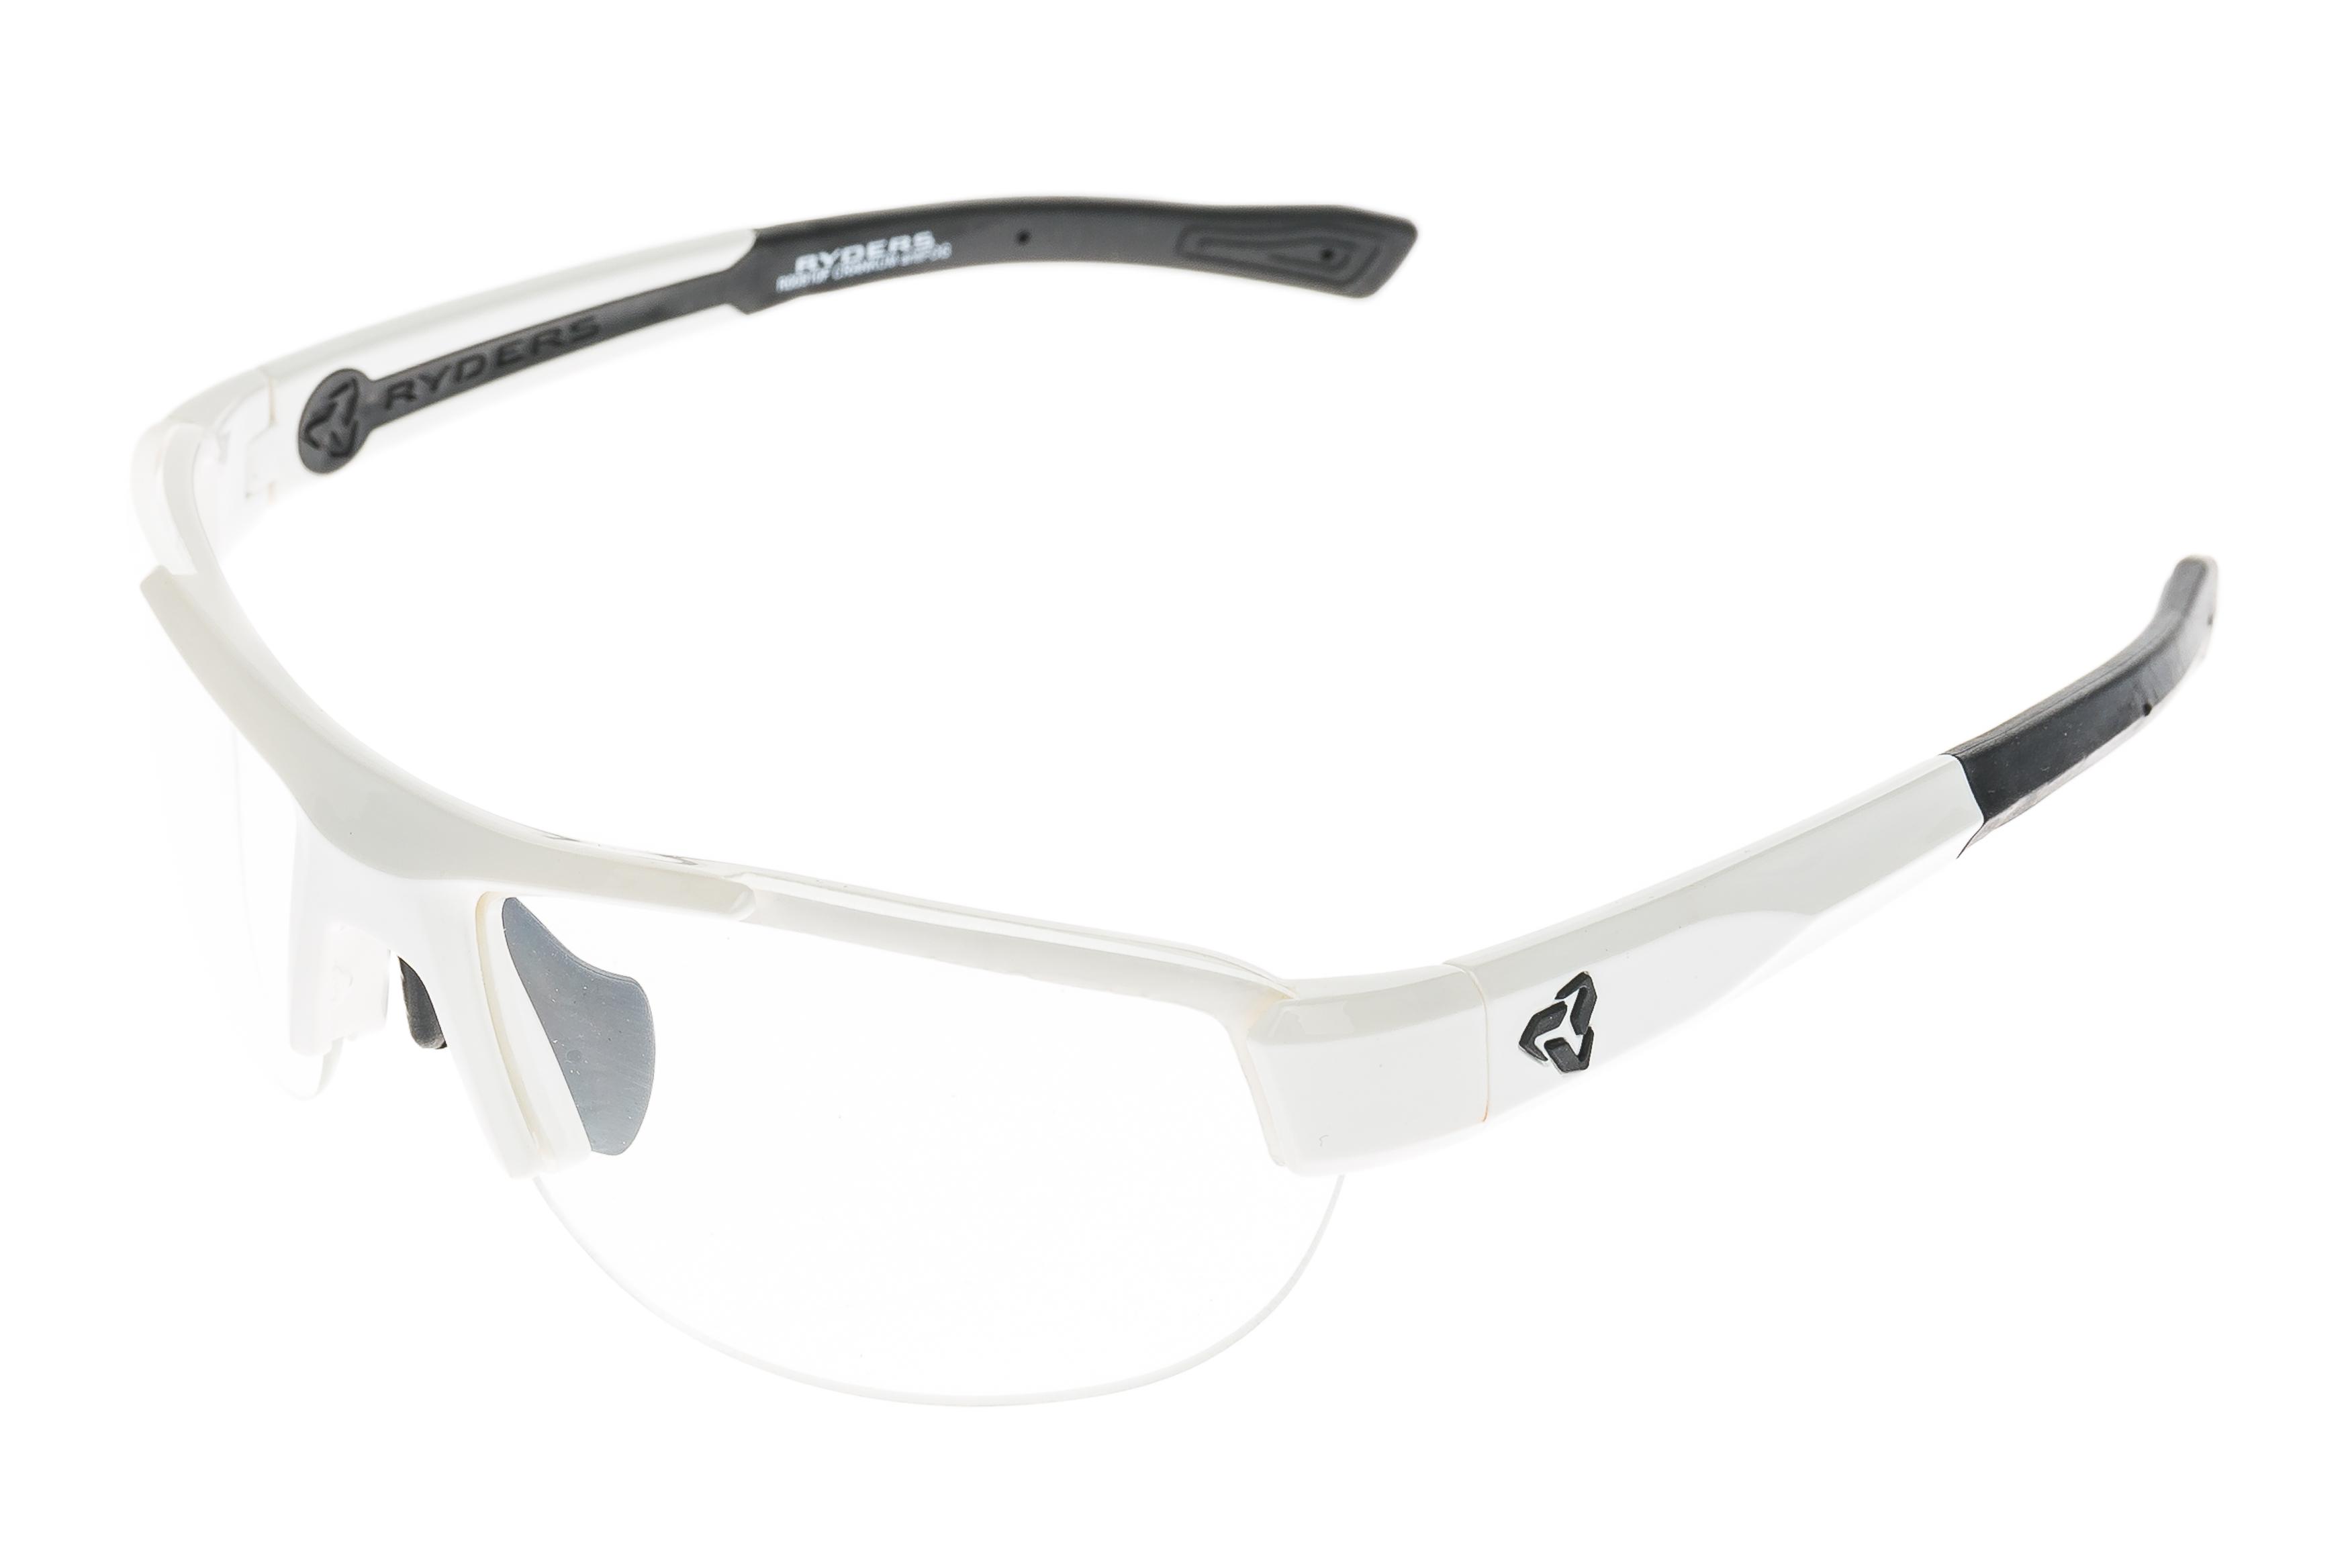 894a56499e6 Details about Ryder Crankum Sunglasses Polished White Frame Clear Anti-Fog  Lens - Excellent